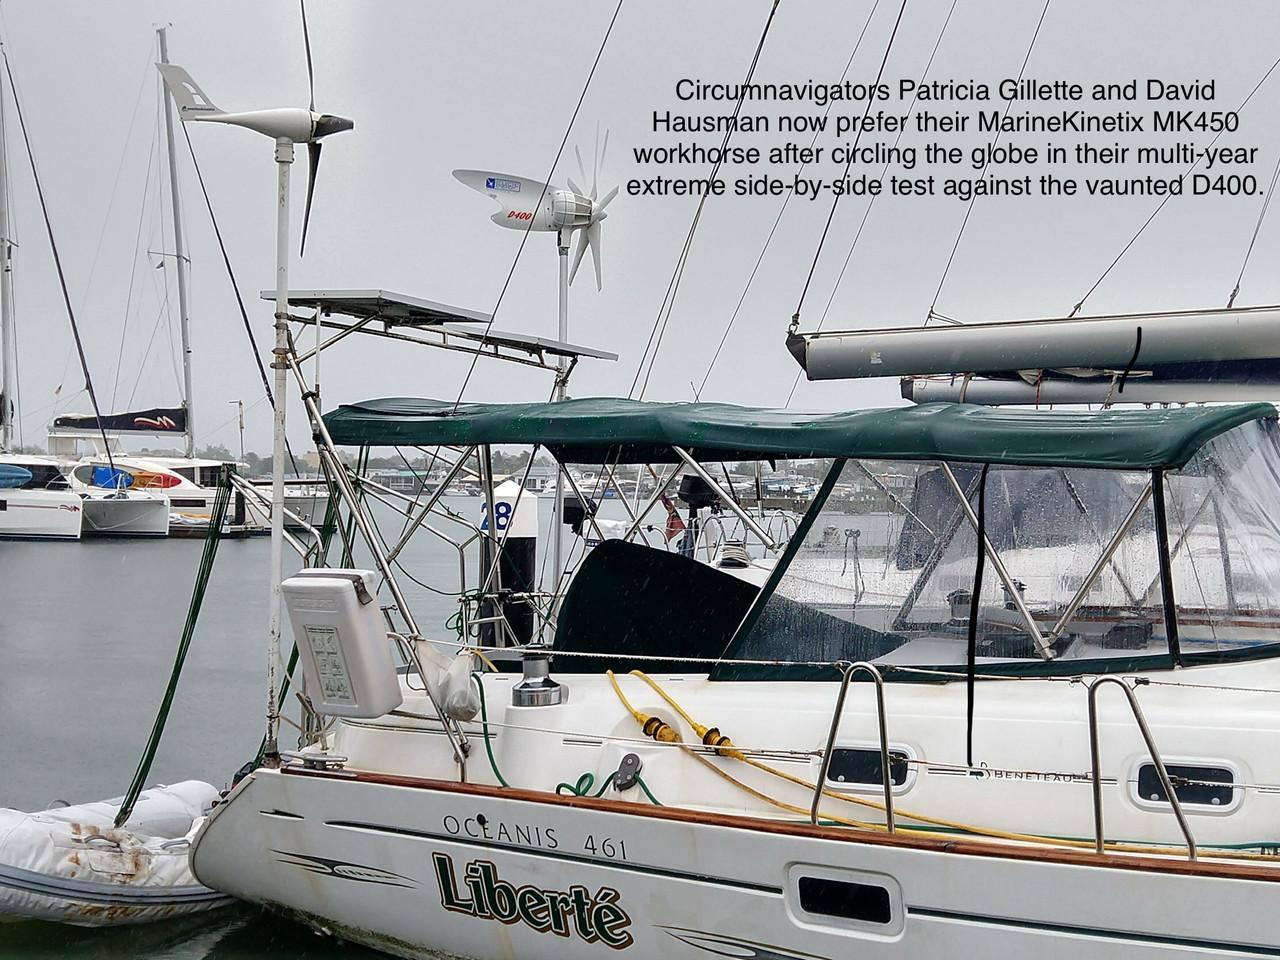 The ultimate multi-year circumnavigation test against the popular D400.  Marine Kinetix wins again!